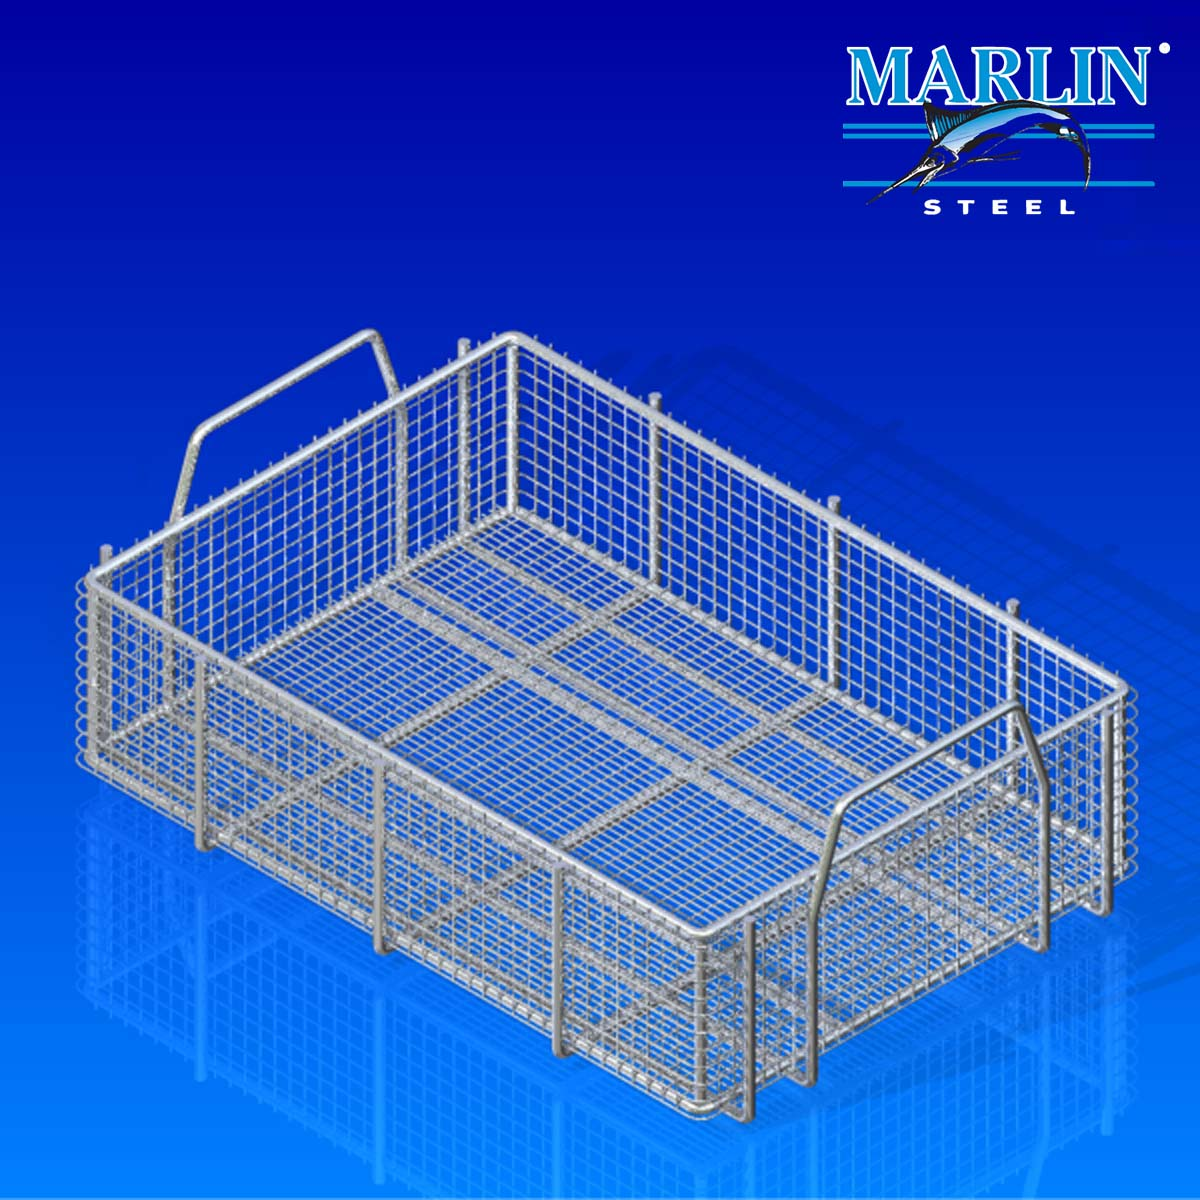 Marlin Steel Basket with Handles 558003